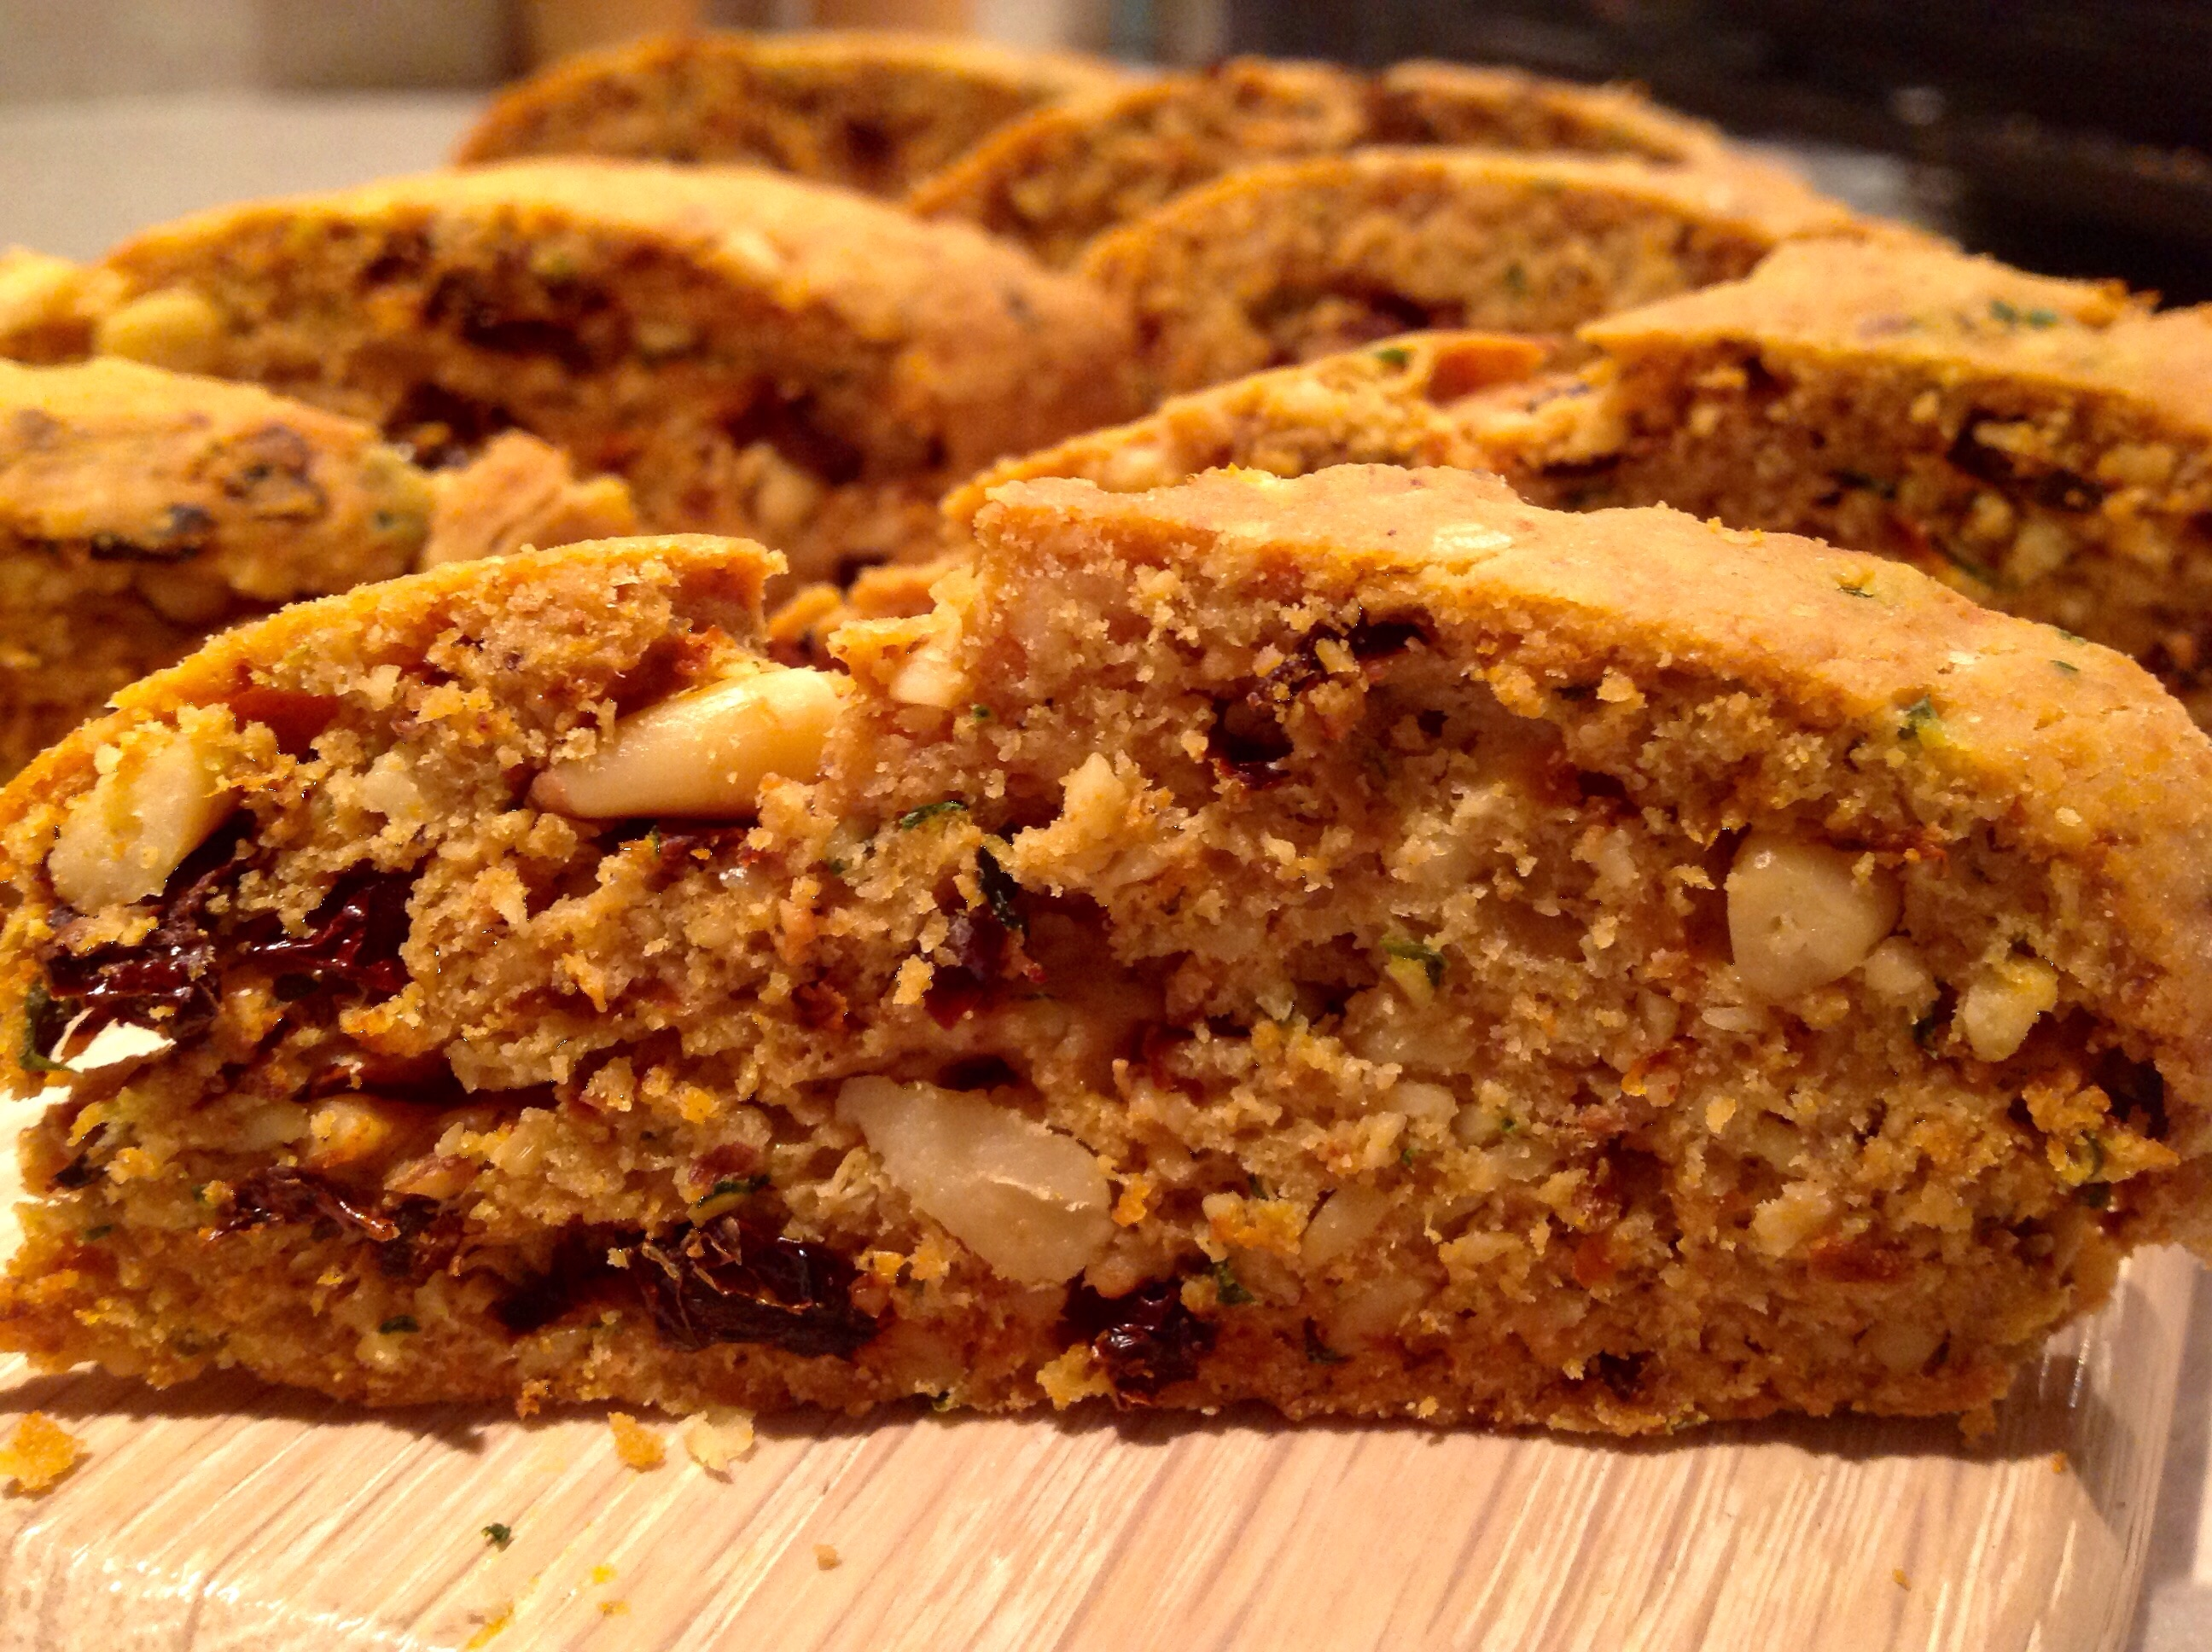 Savoury nibbles canap s bakingfanatic for Gluten free canape ideas